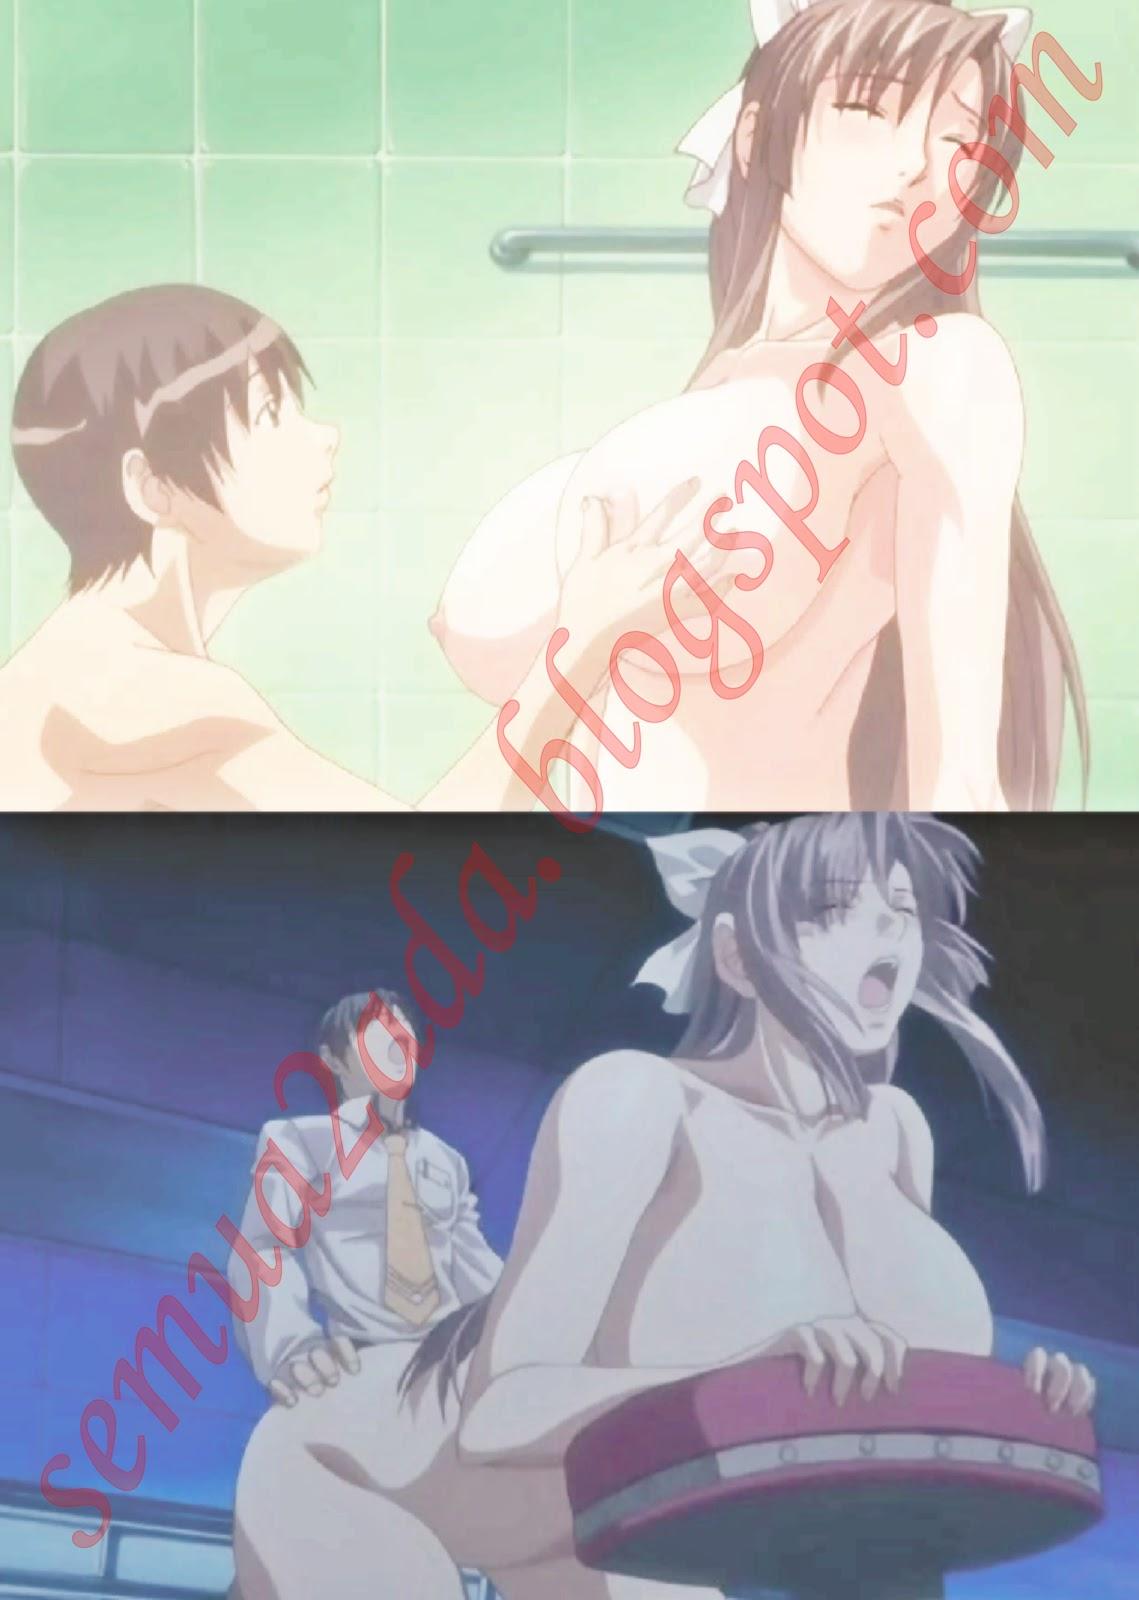 Semua Ada Anime Porn Movie Cleavage Subtitle Indonesia-6625